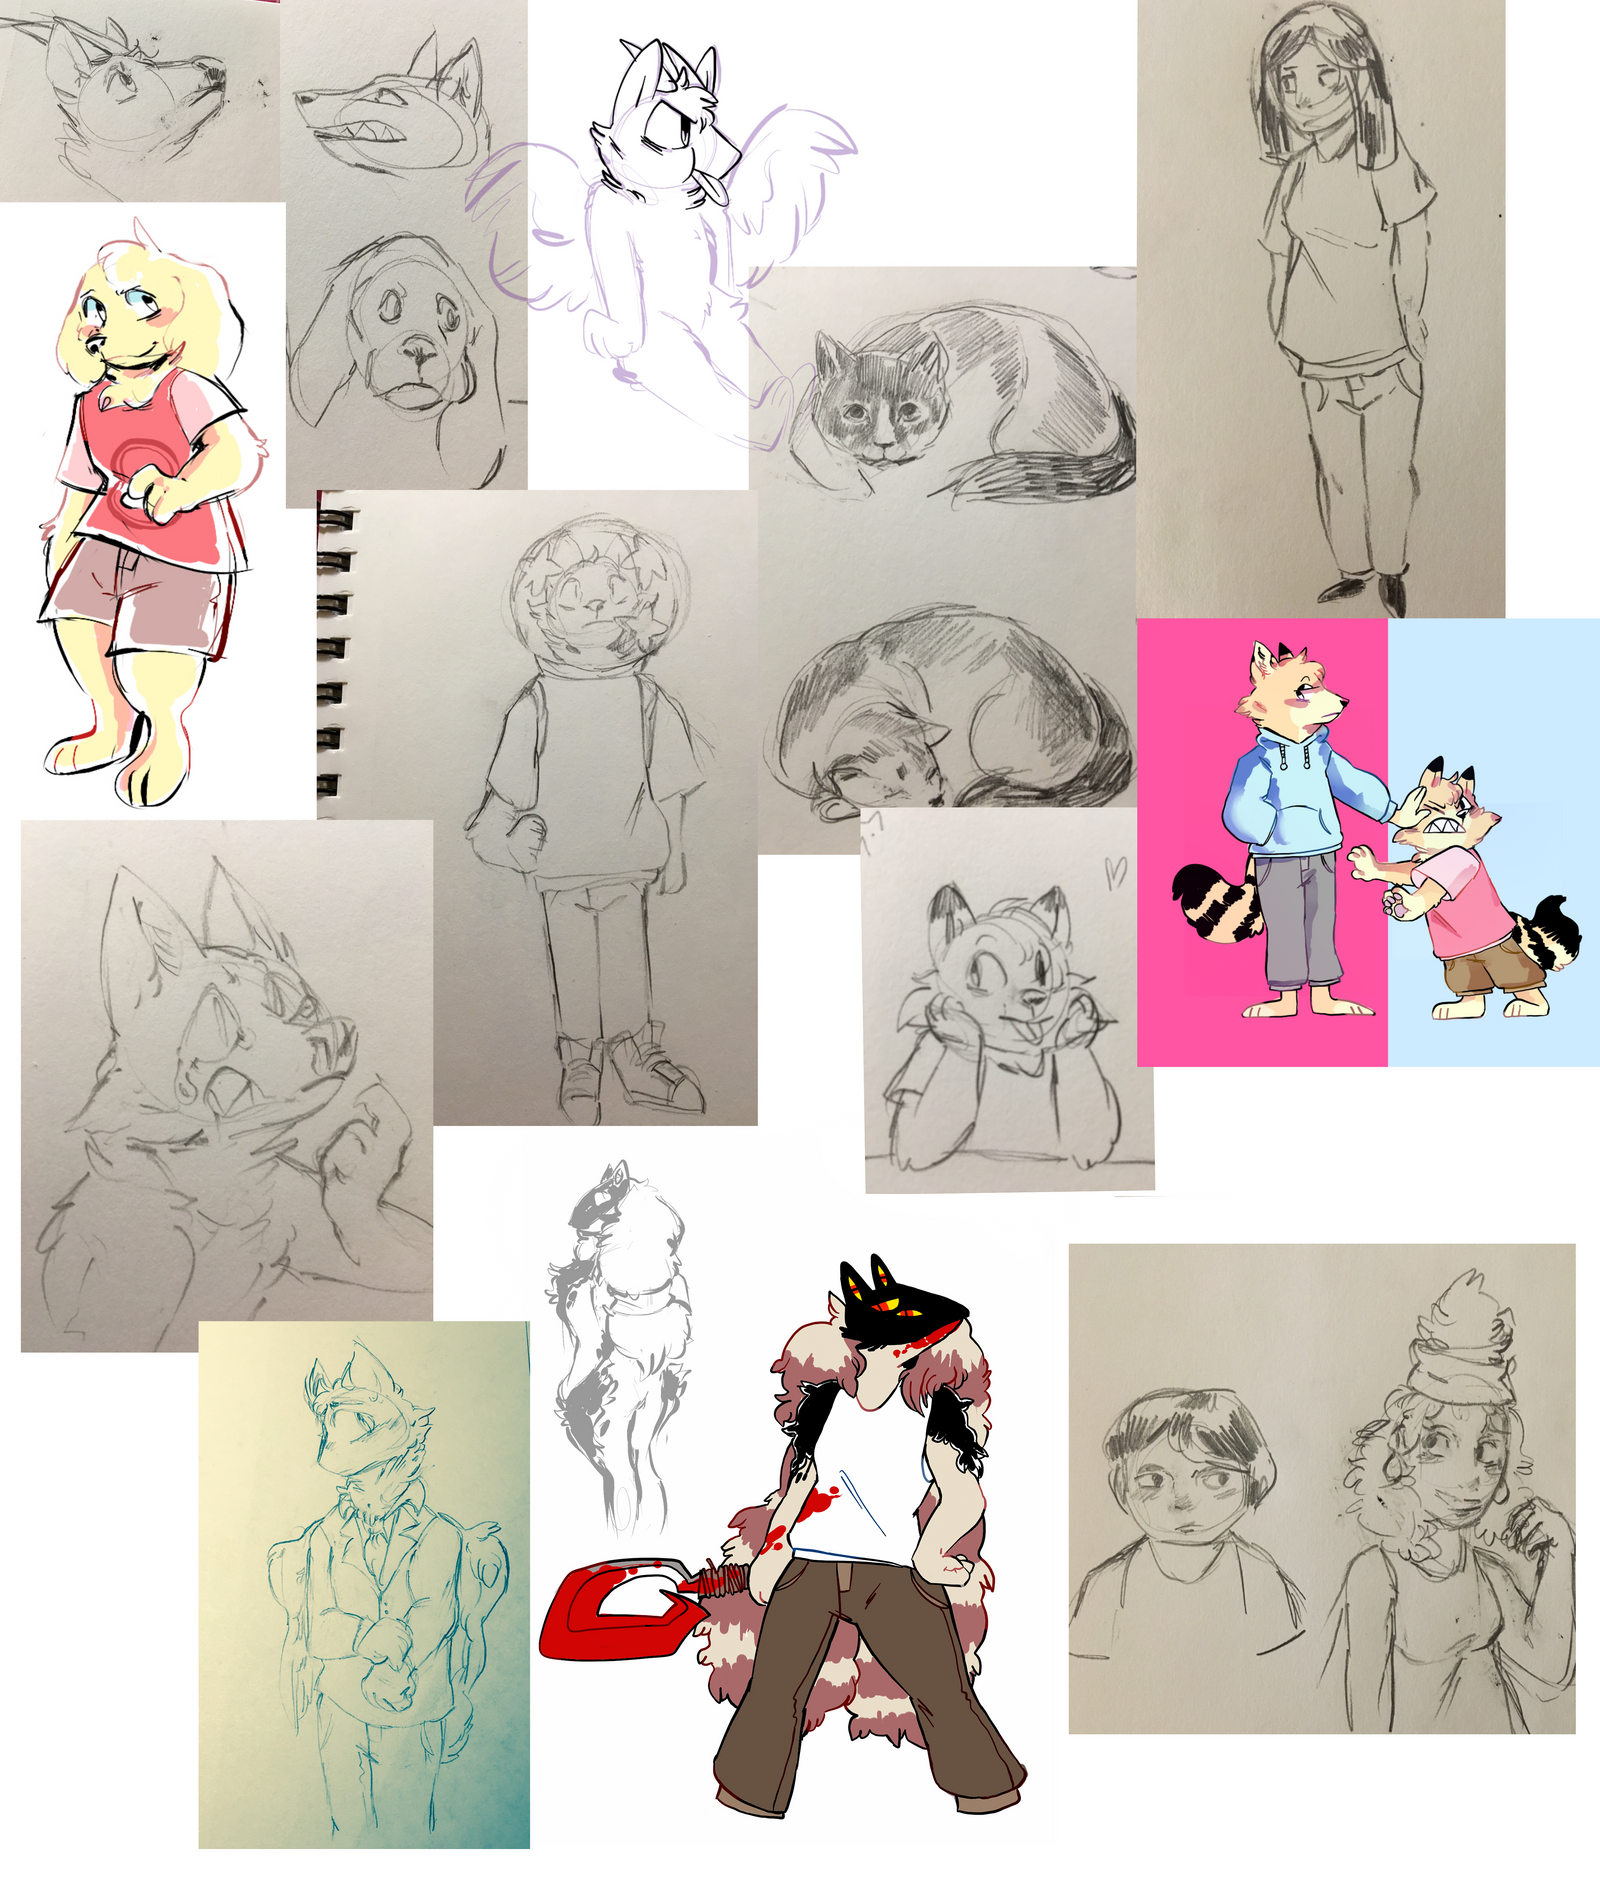 sketchdump1 by cayotze